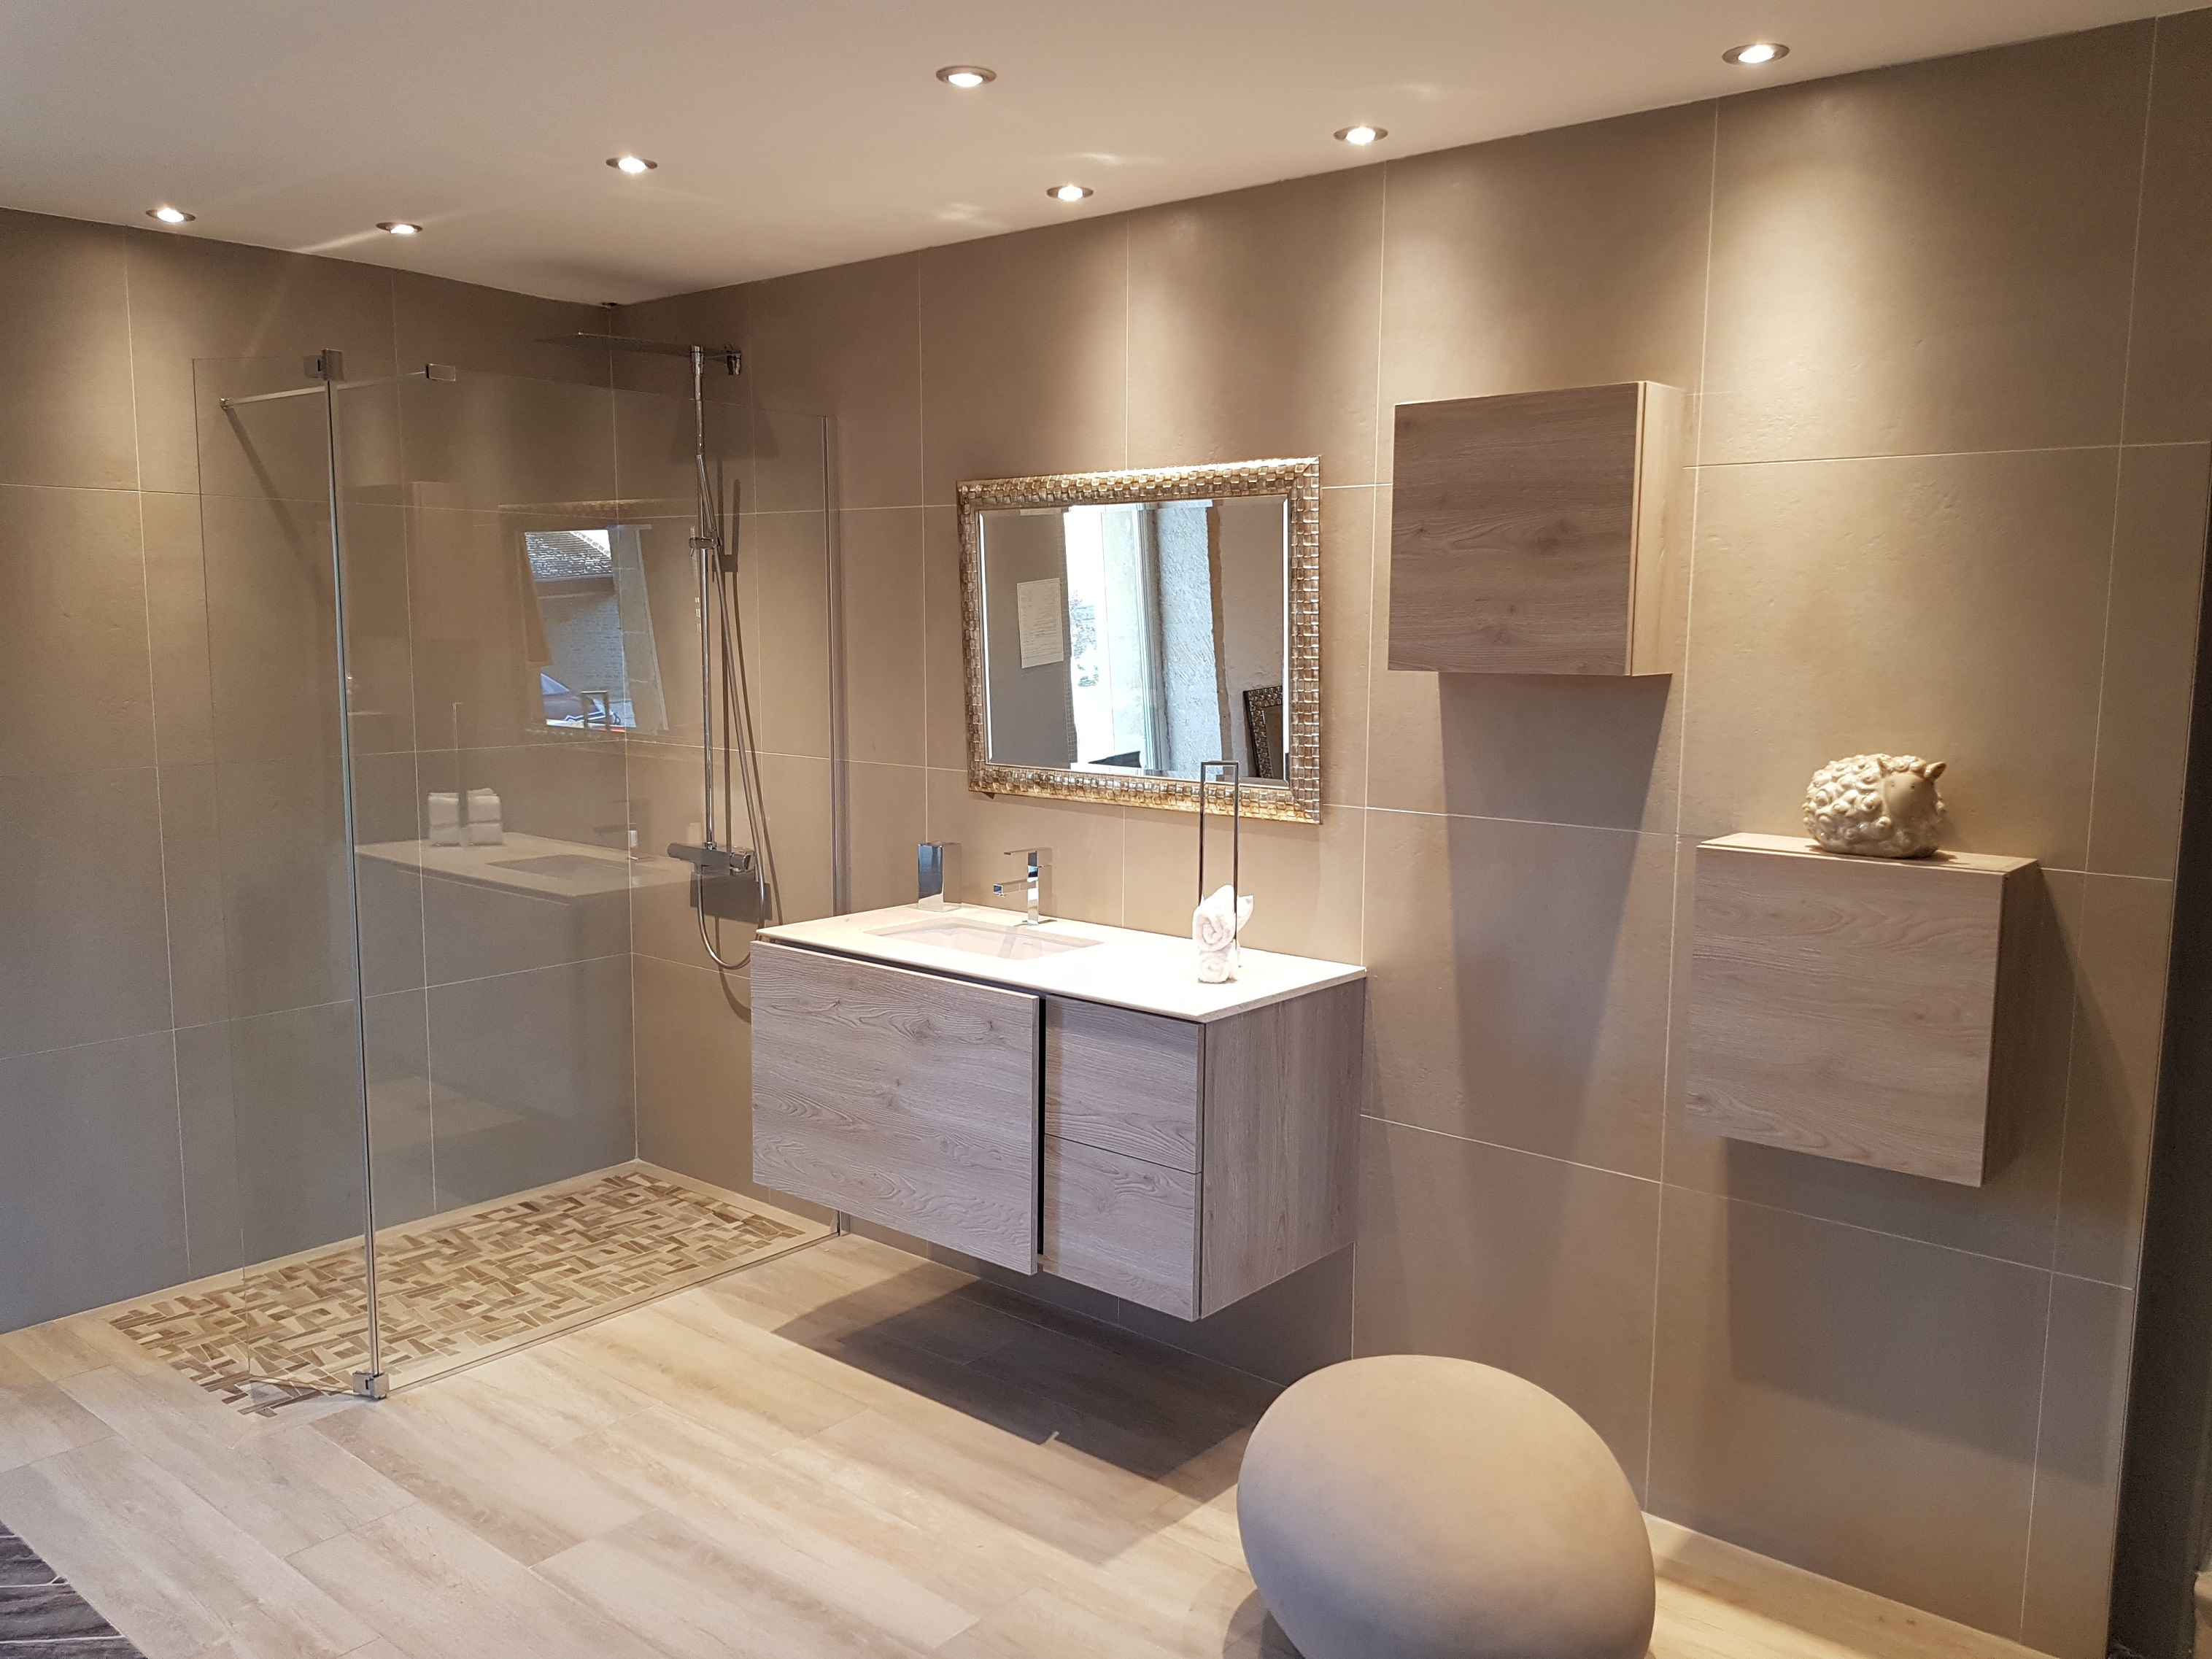 Dressing salle de bain humidit 20170621171929 for Humidite salle de bain